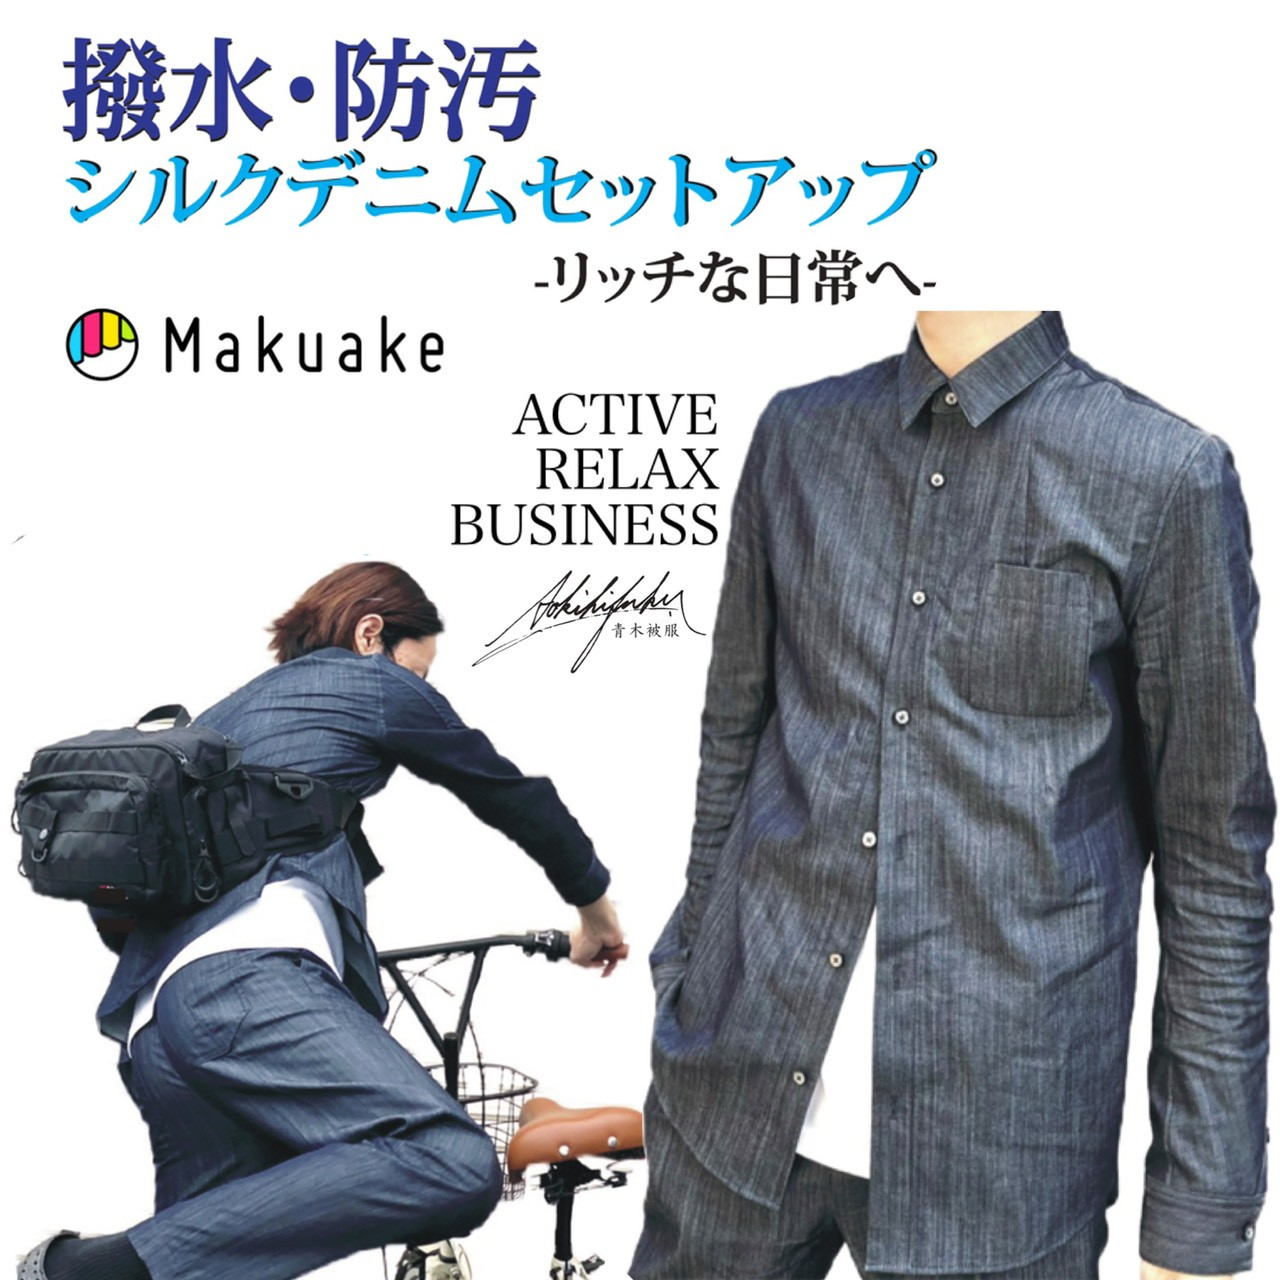 Makuake第二弾プロジェクト始動!